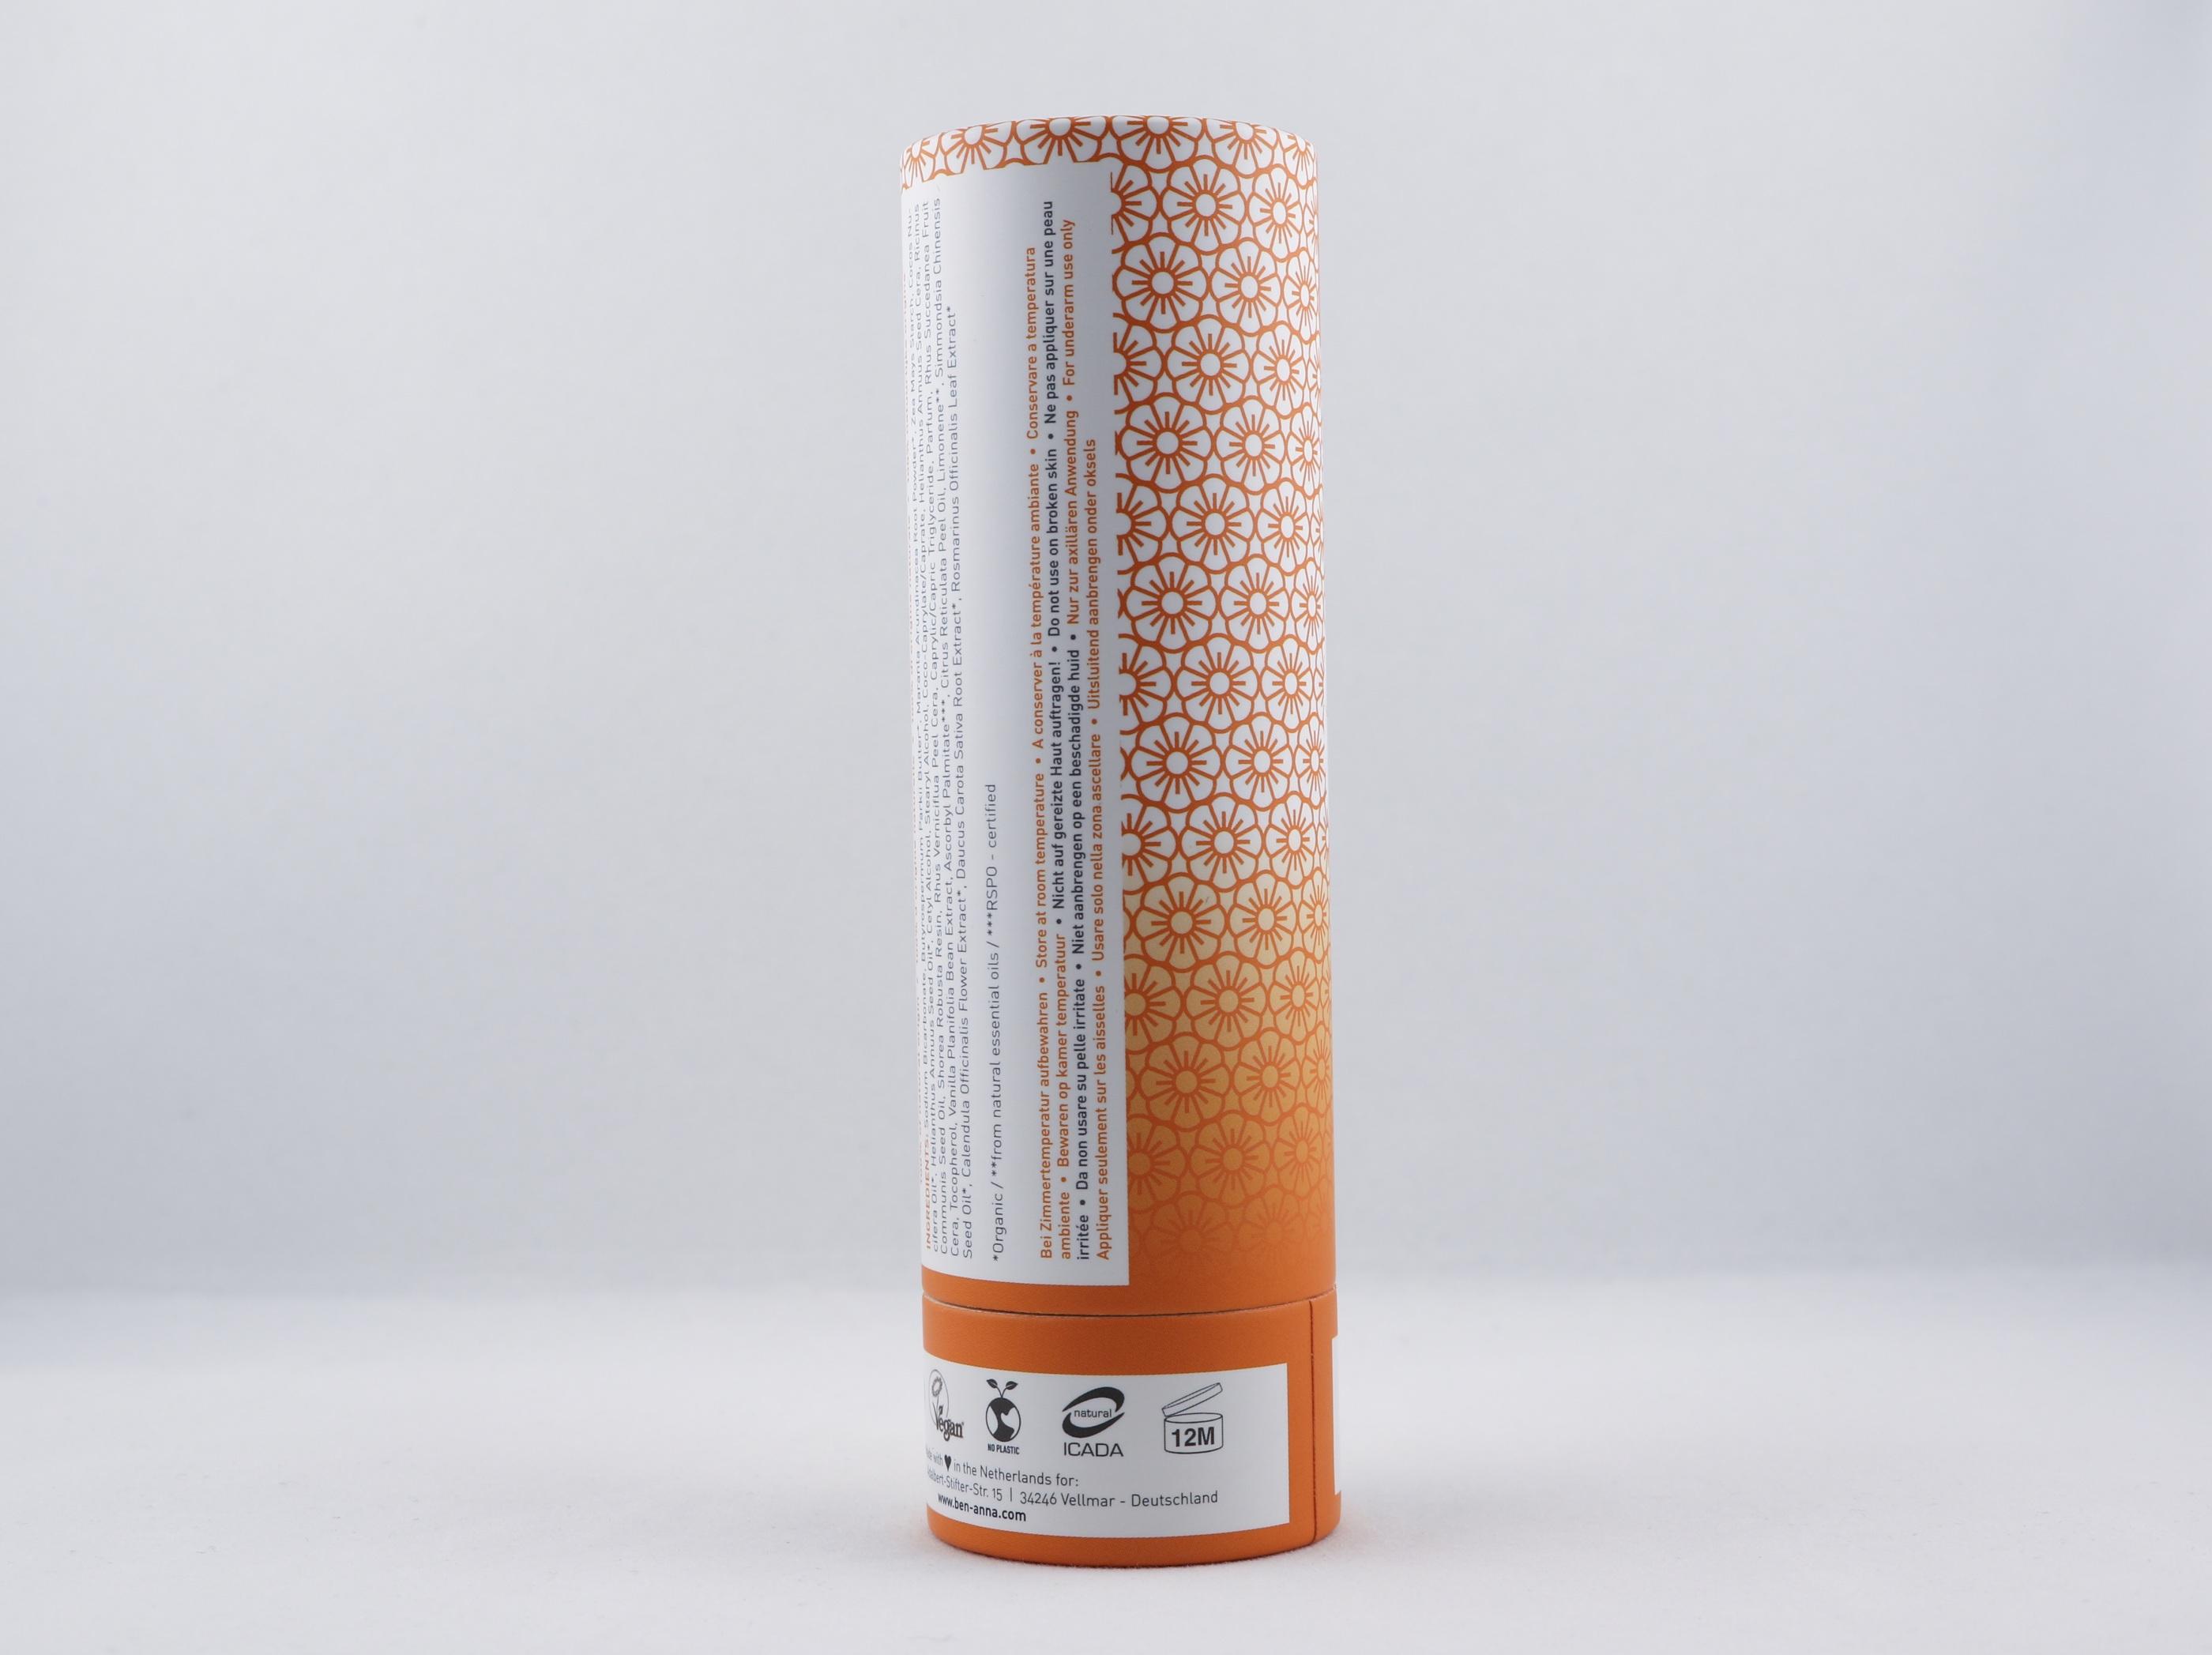 Deodorant - Vanilla Orchid wellness ayurveda halmstad sweden svensk hygien